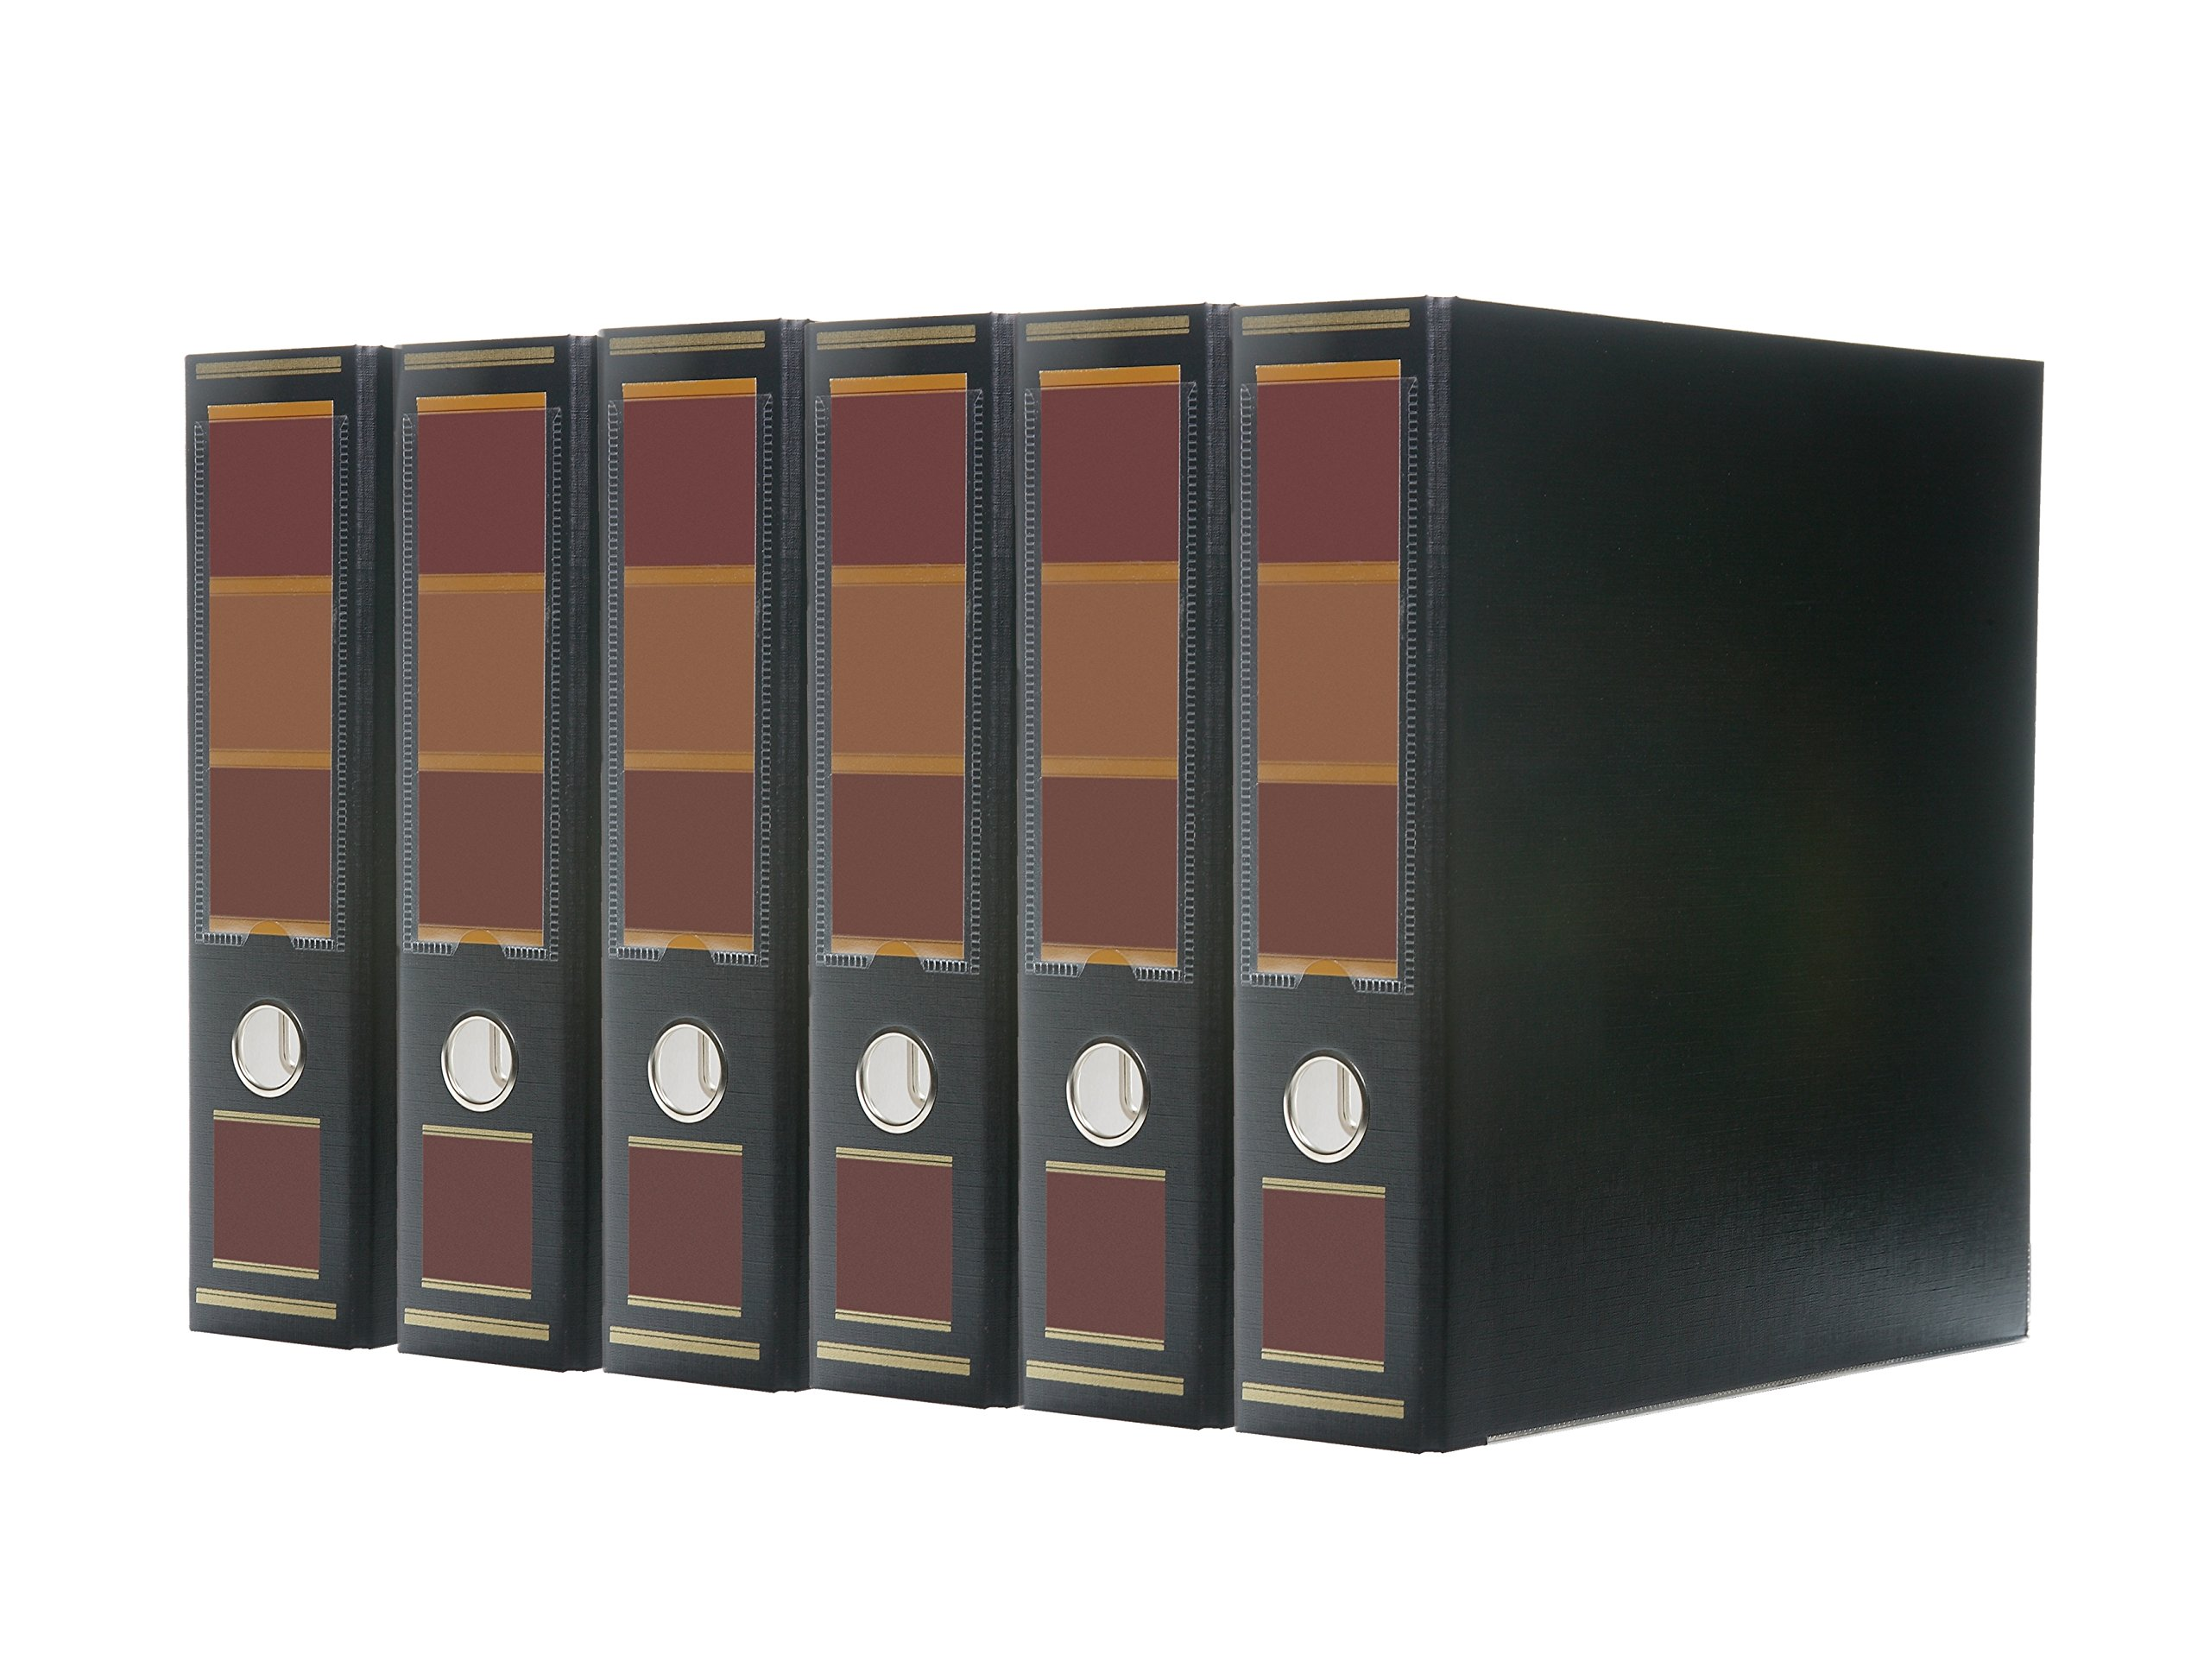 Bindertek 3-Ring 3-Inch Premium Linen Textured Binder 5-Pack, Barrister Black (3EFPACK-BB)